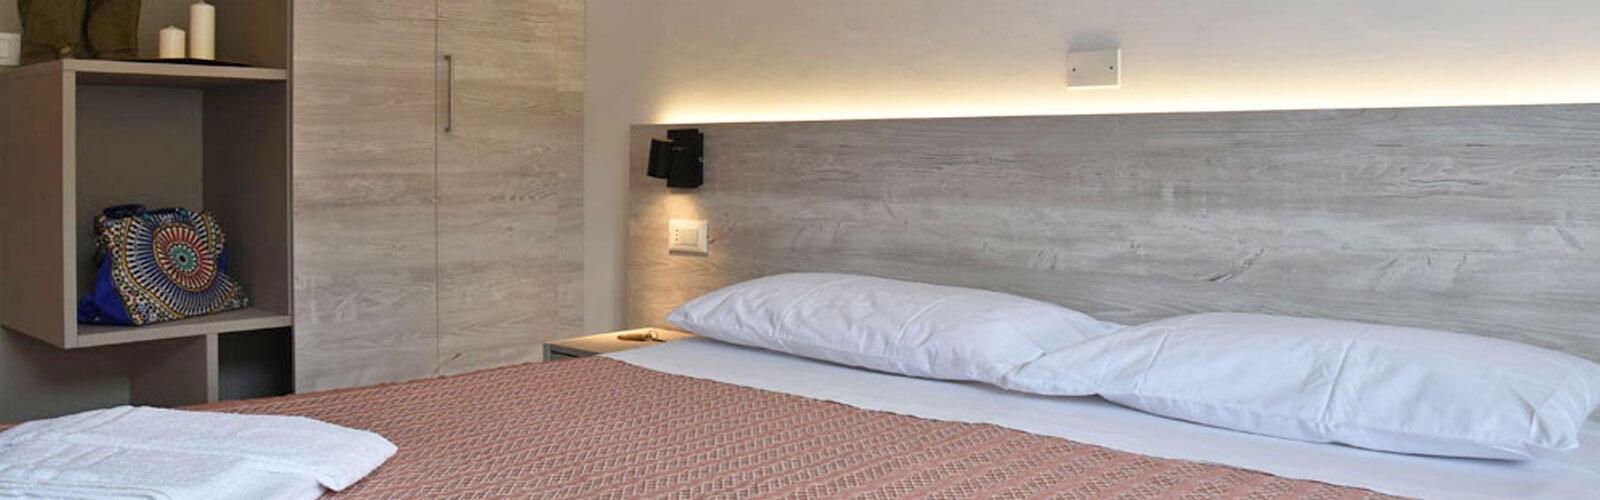 hotellaninfea it le-camere 002